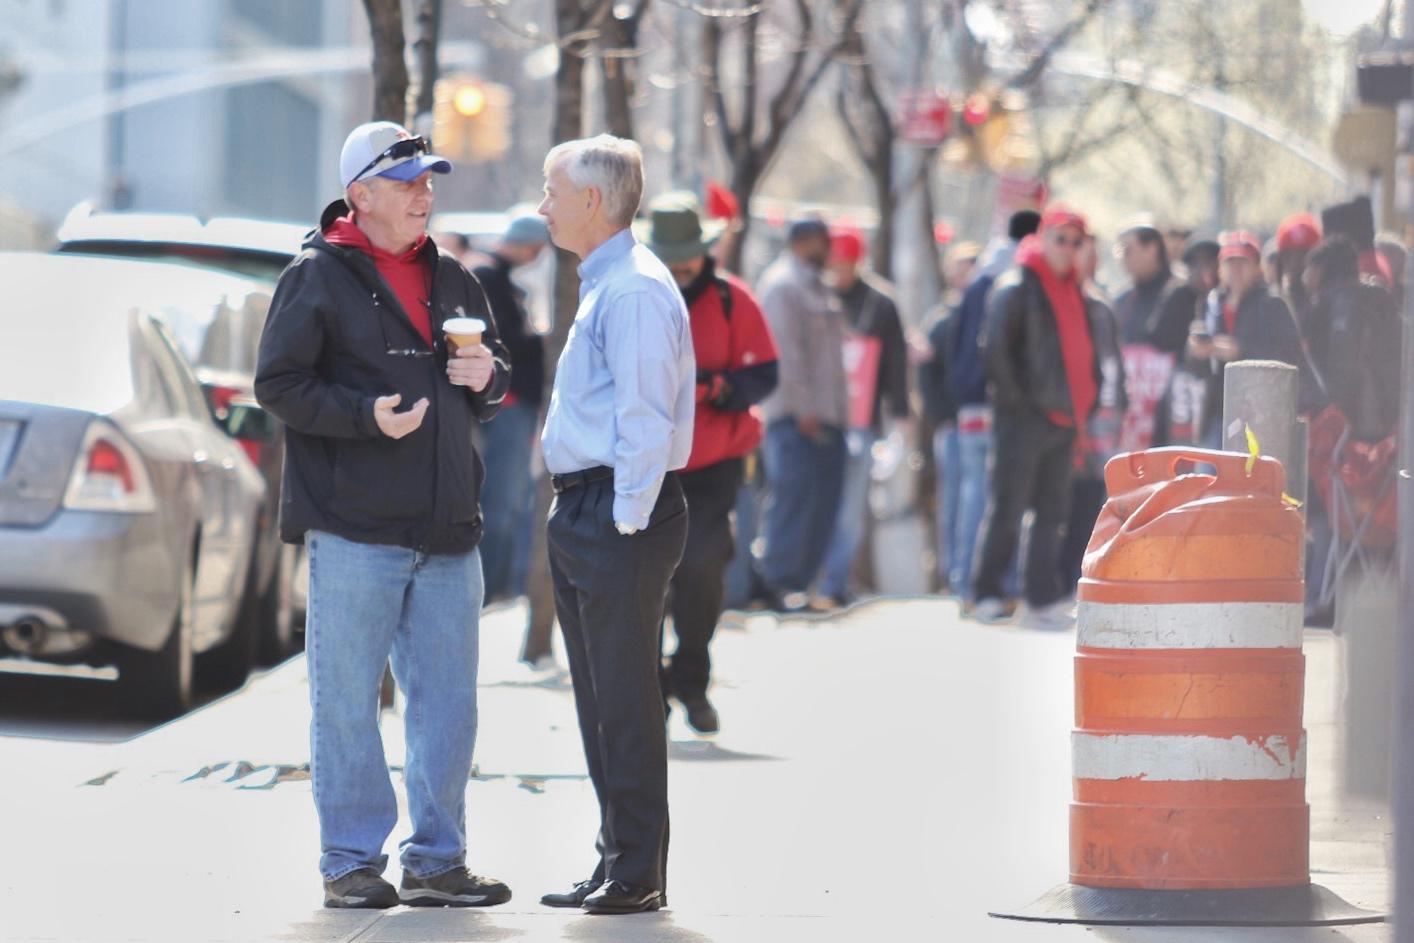 Verizon CEO meets striking workers on picket line